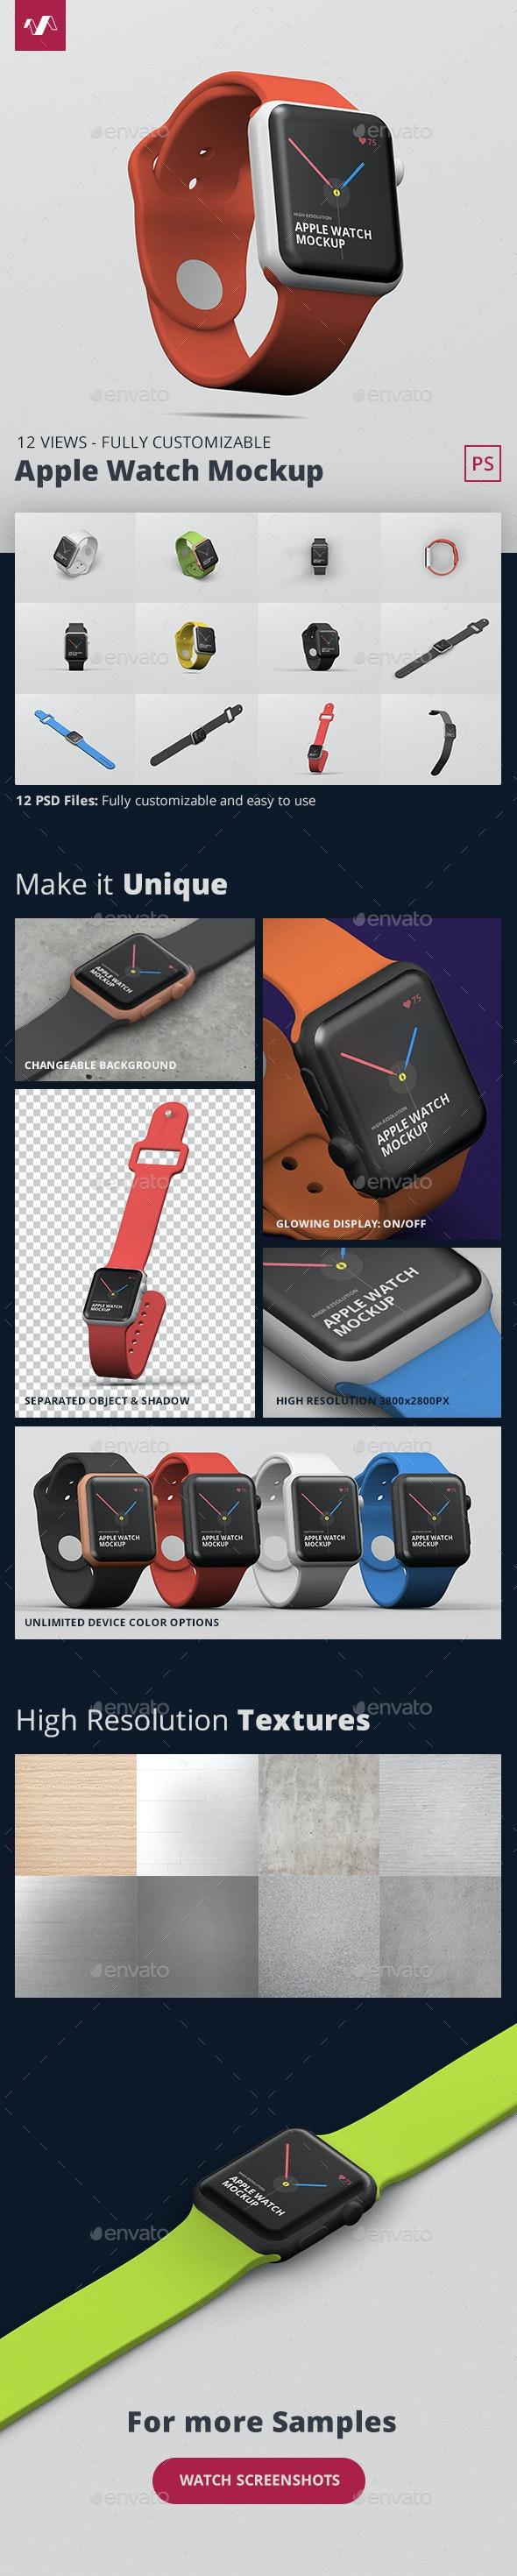 Smart Watch Mockup - Mobile Displays